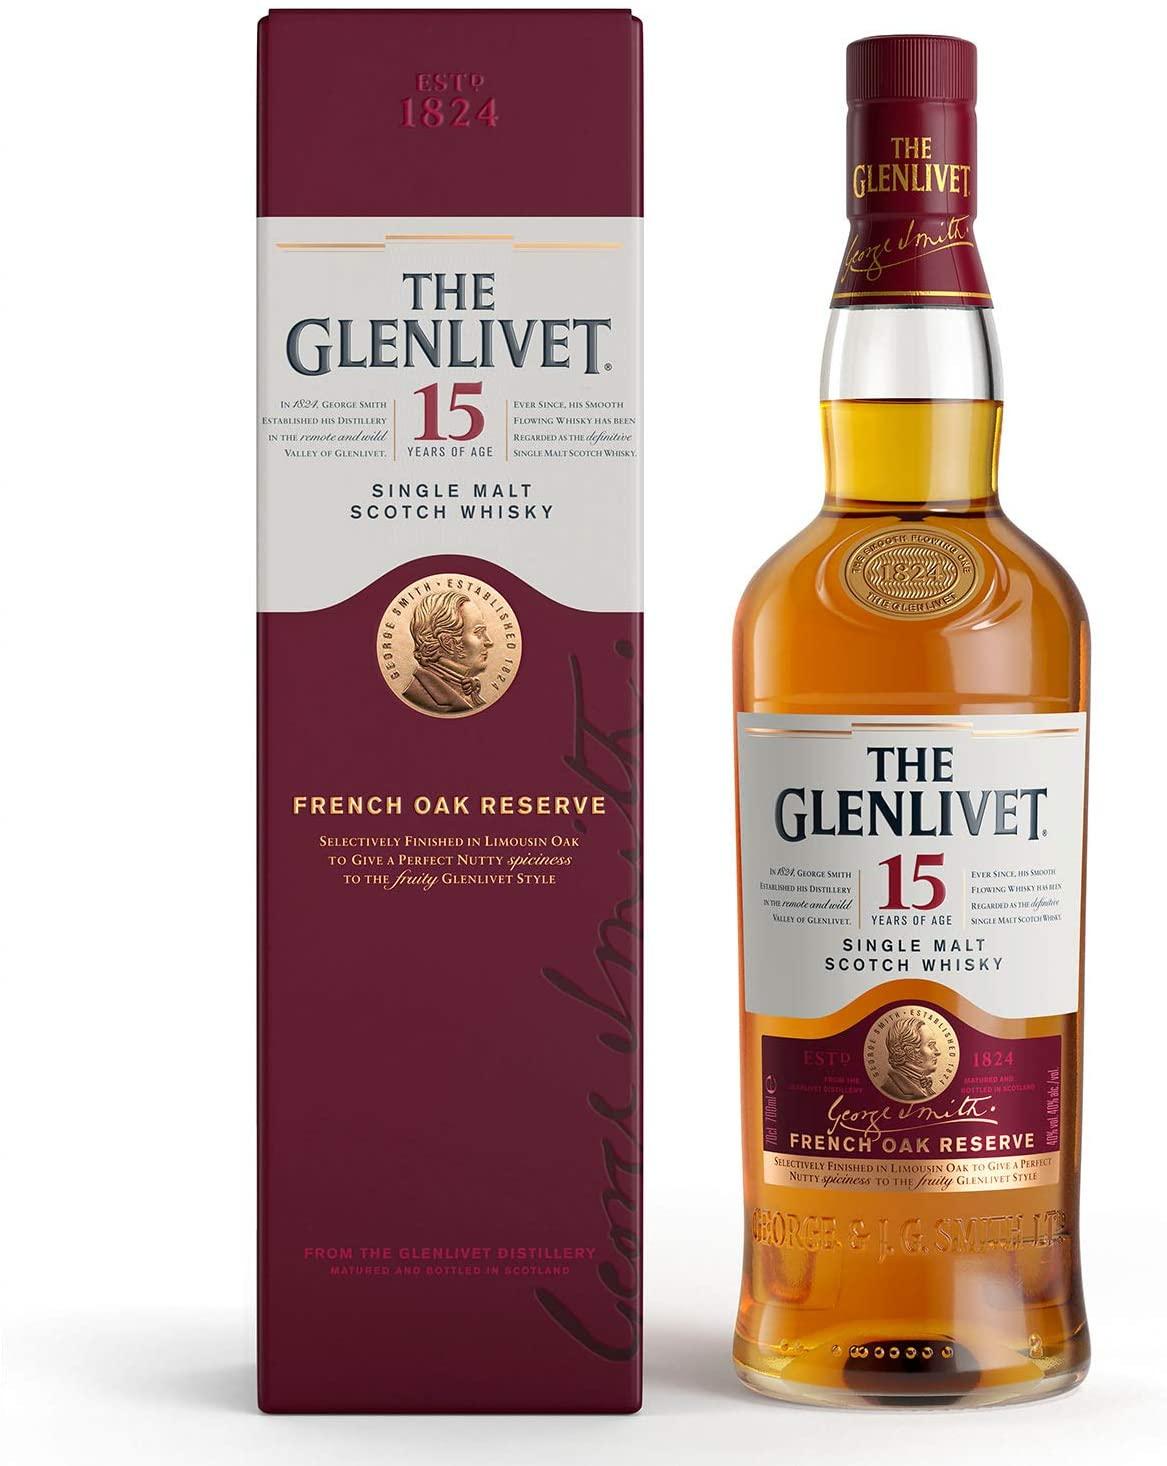 Glenlivet 15 yr single malt whisky 70cl with gift box for £37.99 delivered at Amazon